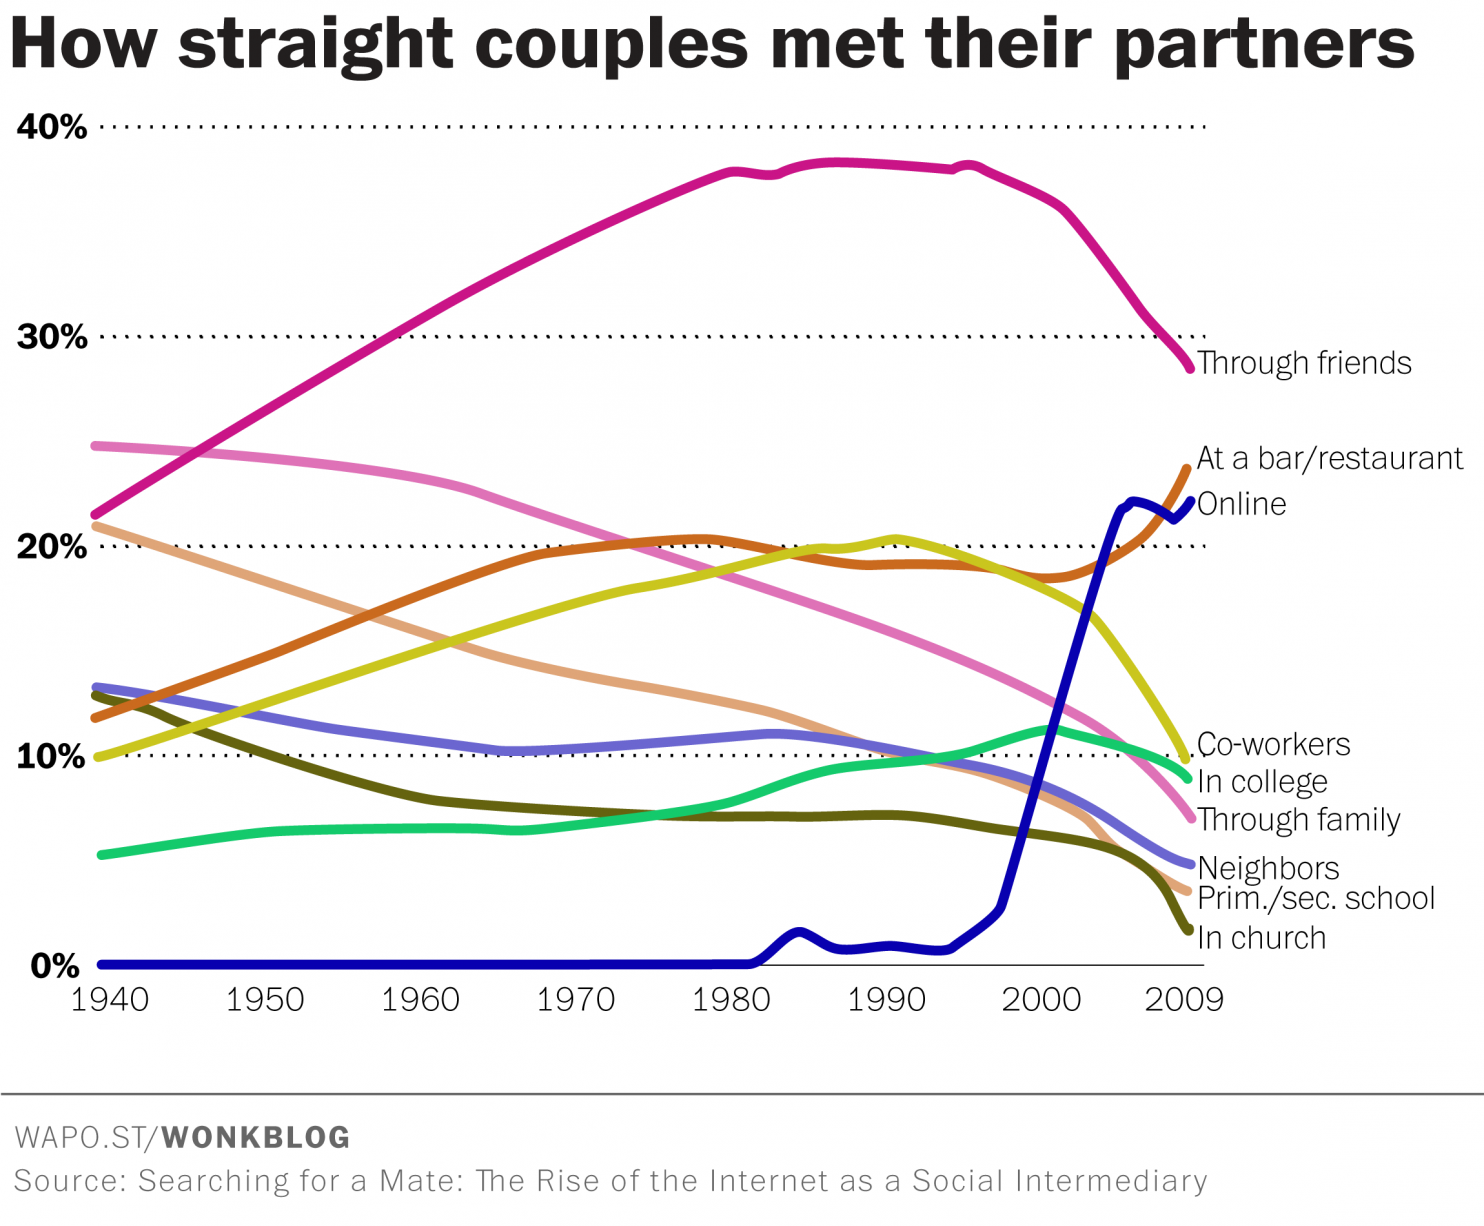 Washington Post online dating anime dating Simulering spill PSP